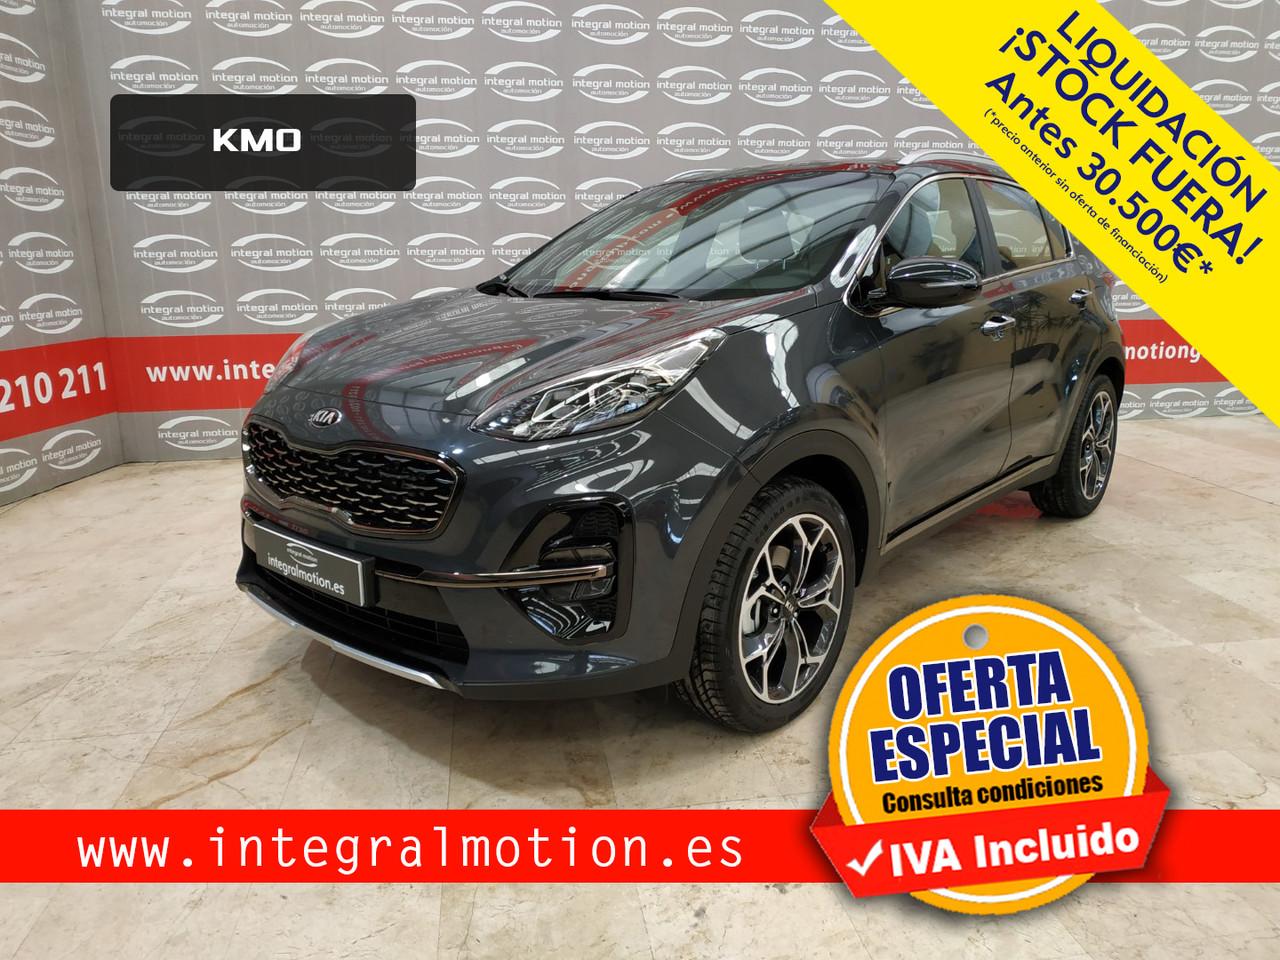 Kia Sportage 1.6 CRDi 100kW GT Line Essential 4x2  - Foto 1